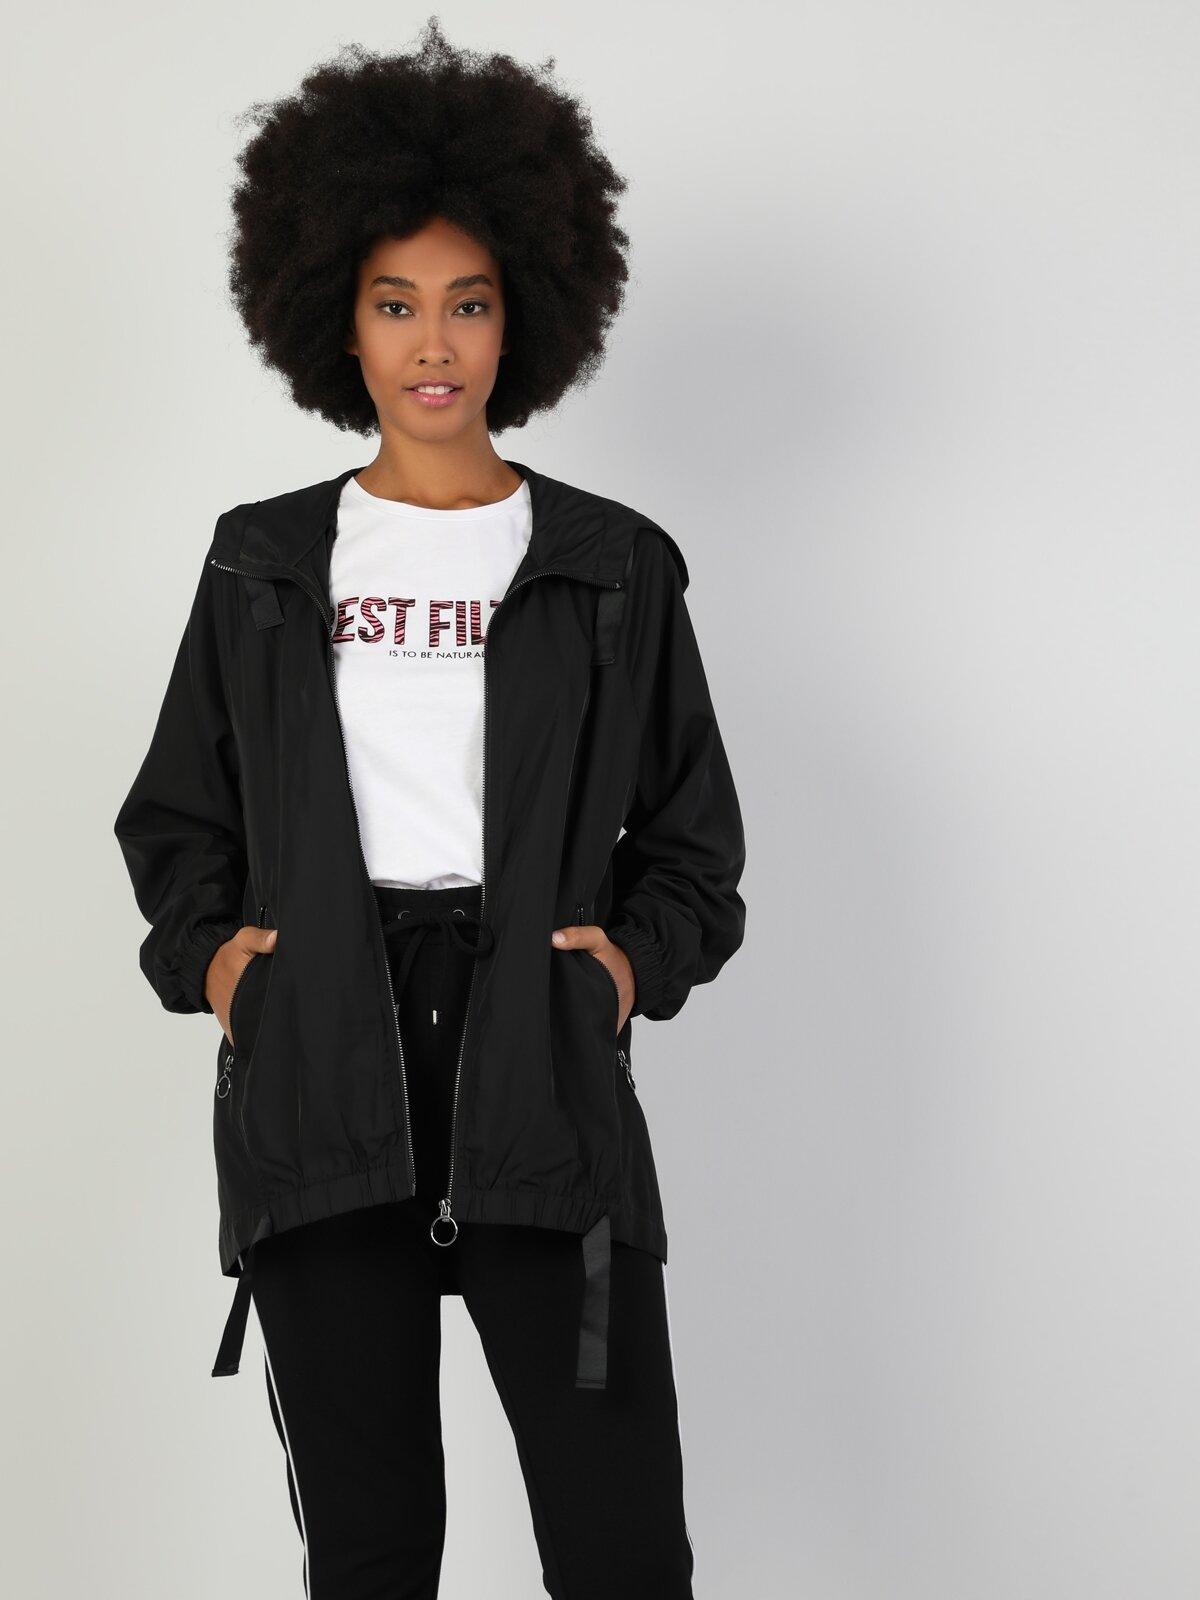 Regular Fit Kapüşonlu Siyak Kadın Mont